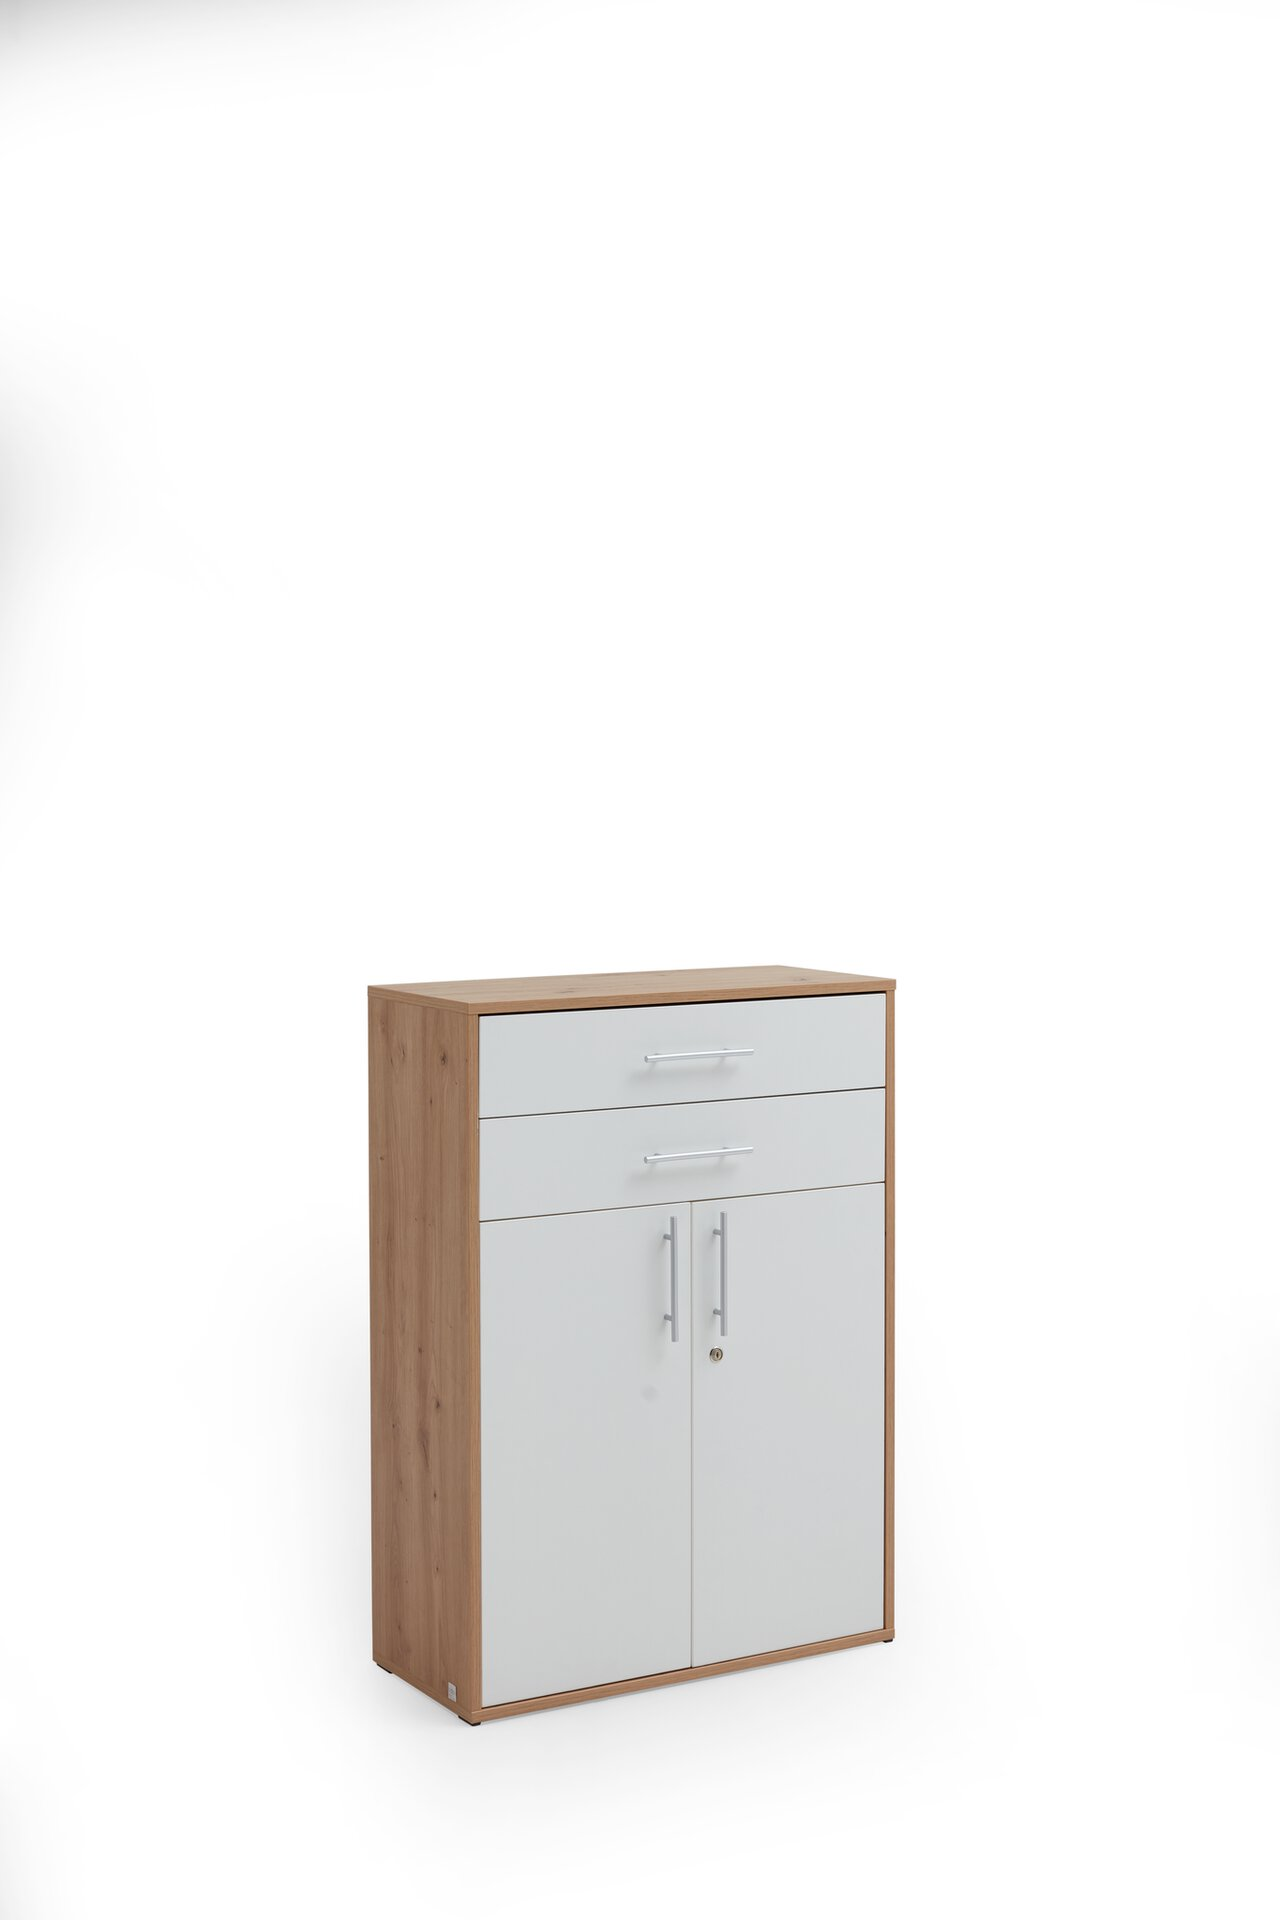 Aktenschrank PRONTO Vito Vito Holzwerkstoff braun 35 x 111 x 80 cm